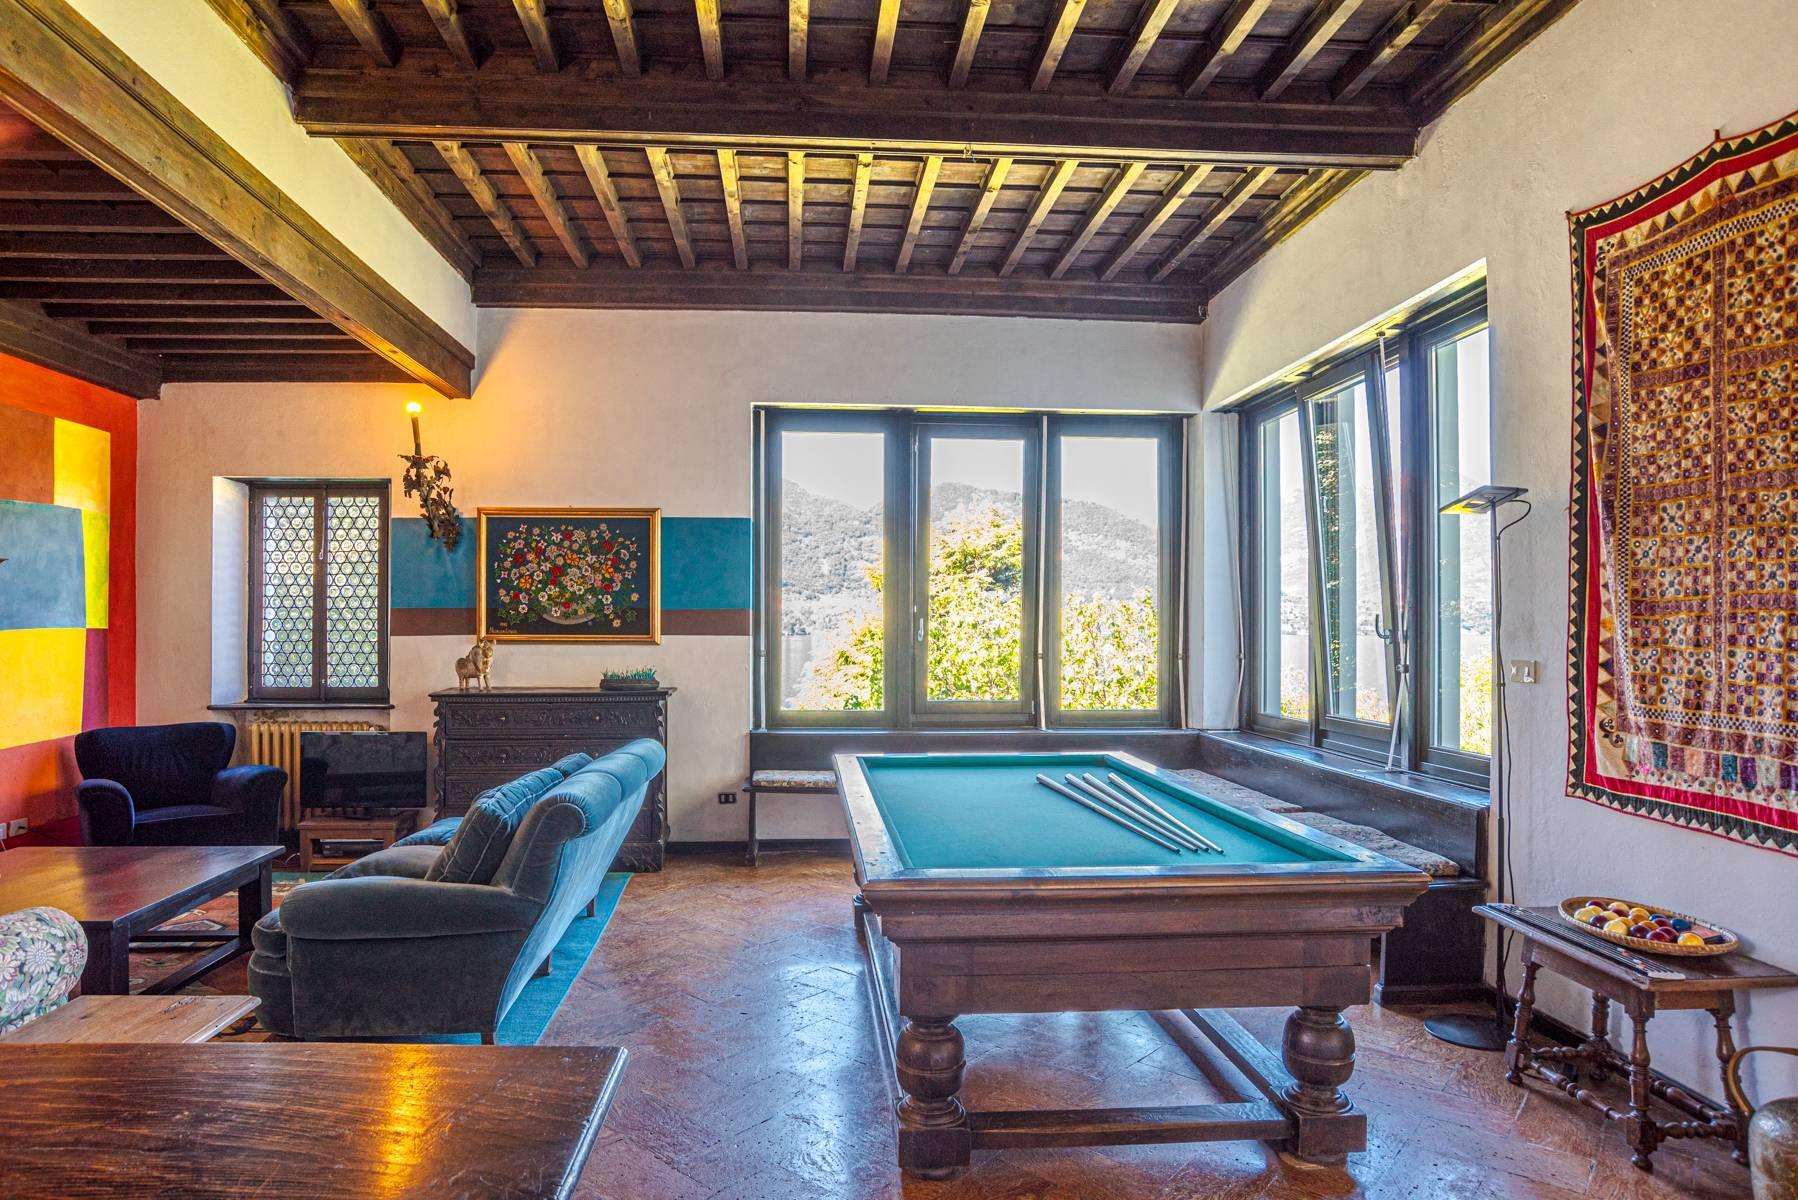 Splendida villa d'epoca con vista lago mozzafiato - 15